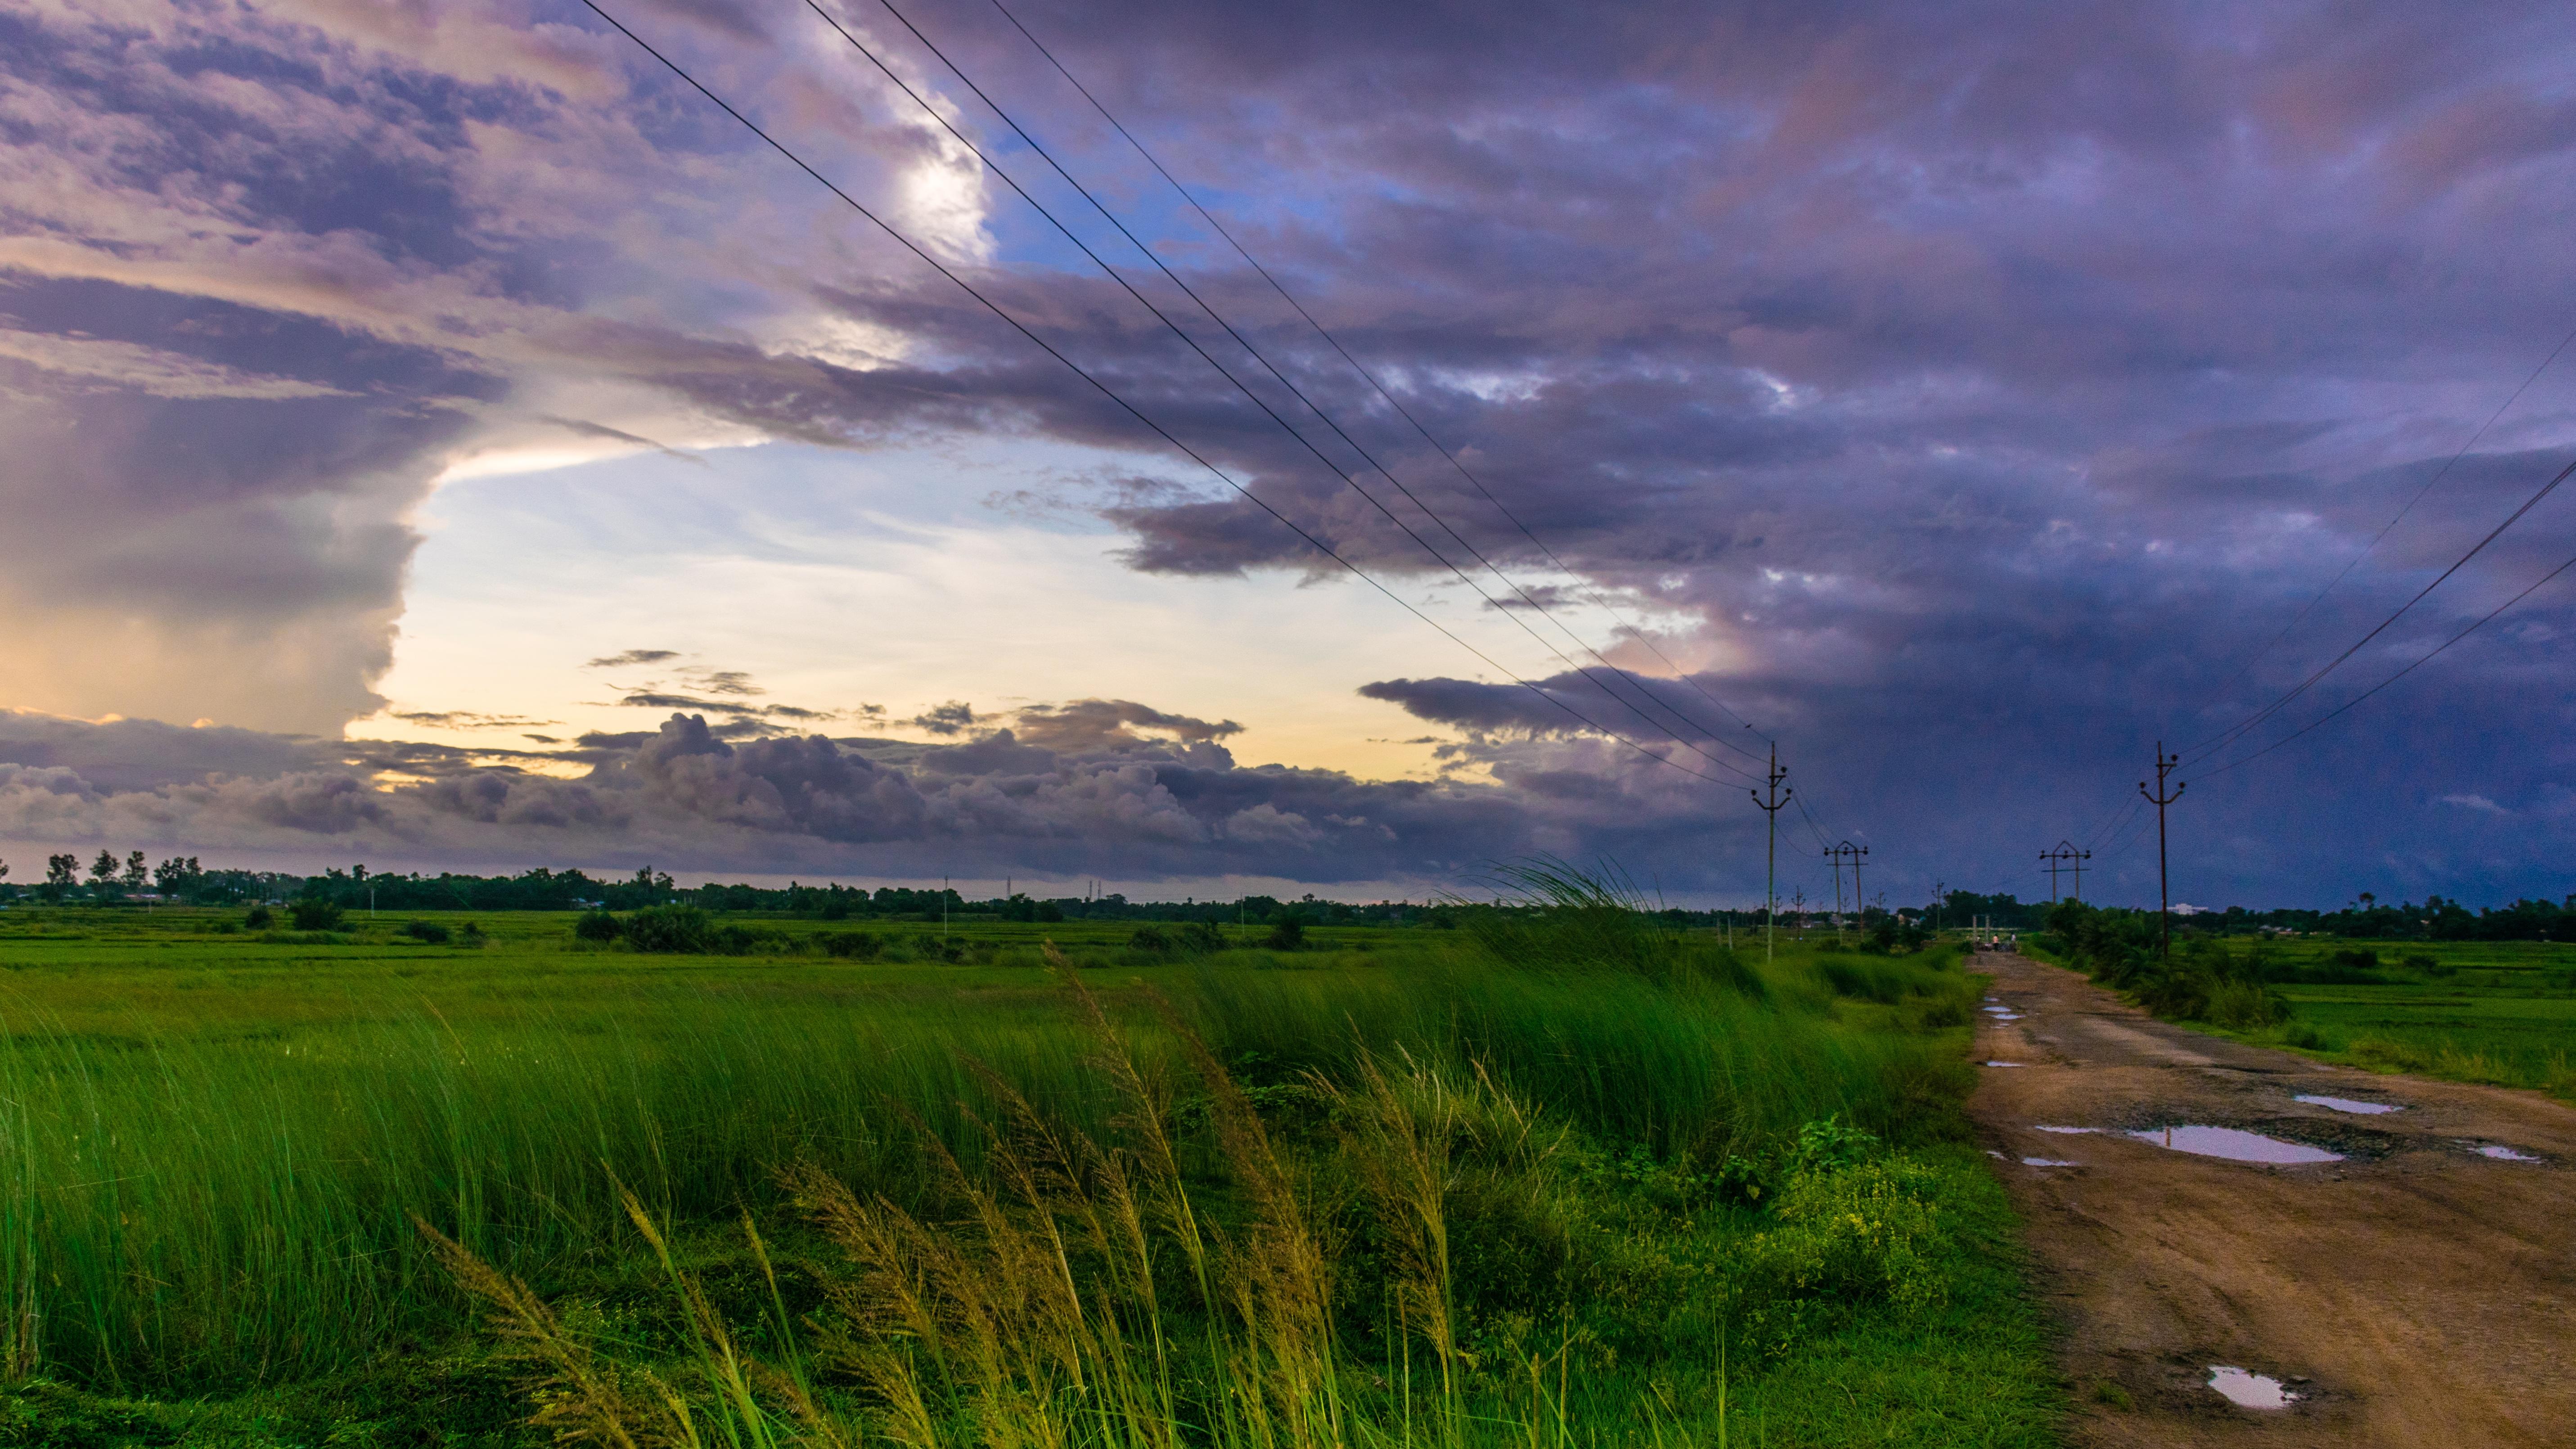 34c3ed07605ad Free Images : landscape, tree, water, nature, outdoor, horizon, marsh,  light, cloud, sky, sun, sunrise, sunset, meadow, prairie, sunlight, cloudy,  morning, ...